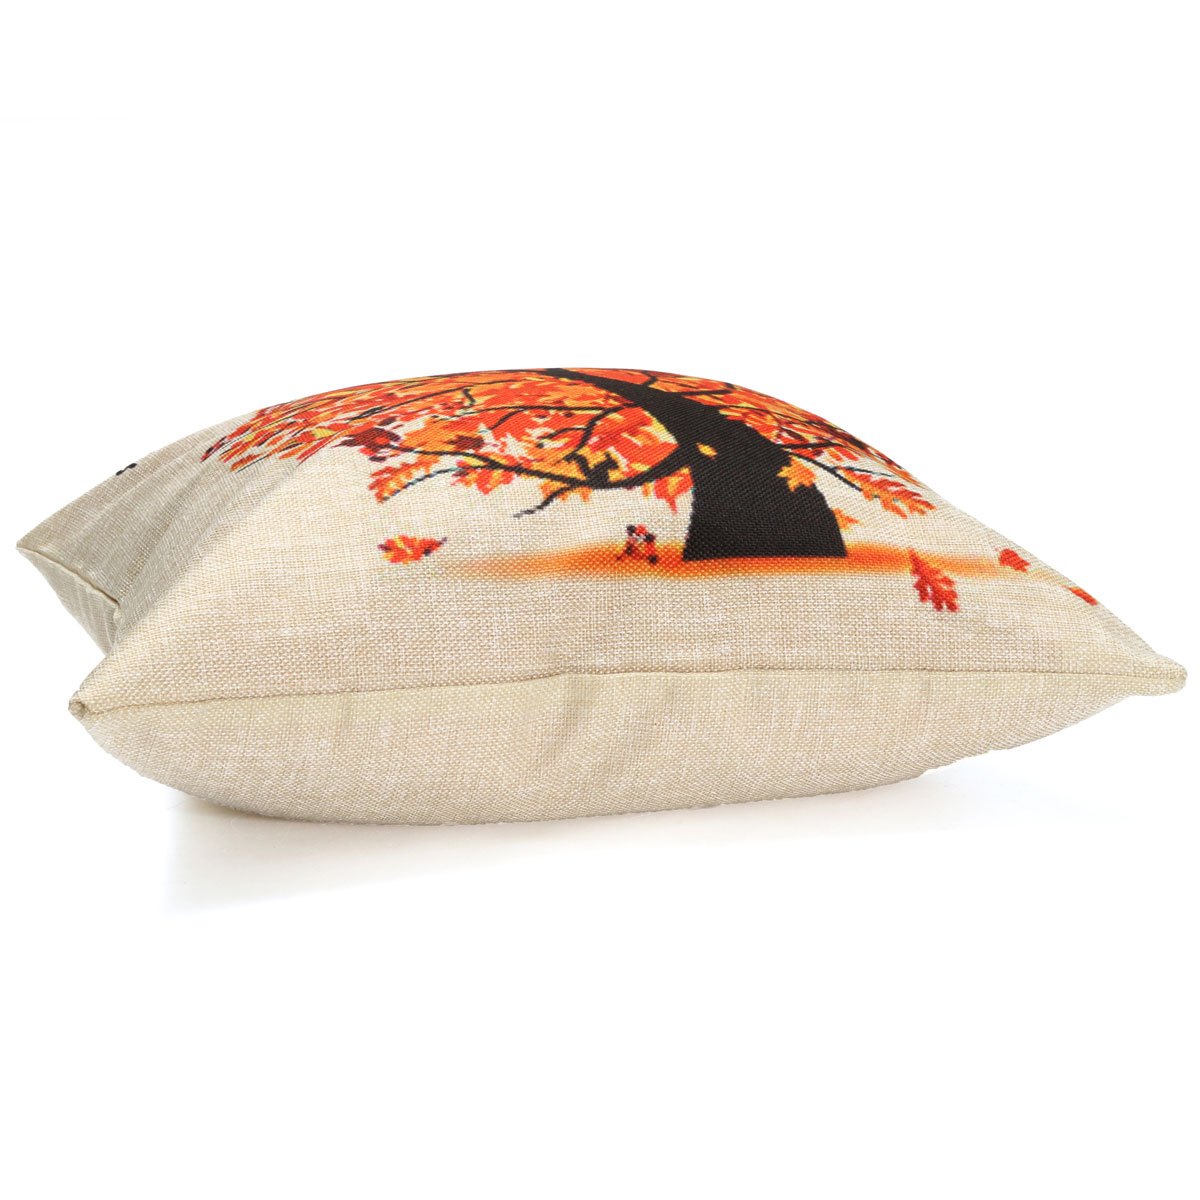 Seasons Tree Cotton Linen Throw Pillow Case Cushion Cover Home Sofa Decoration Dark Orange ...